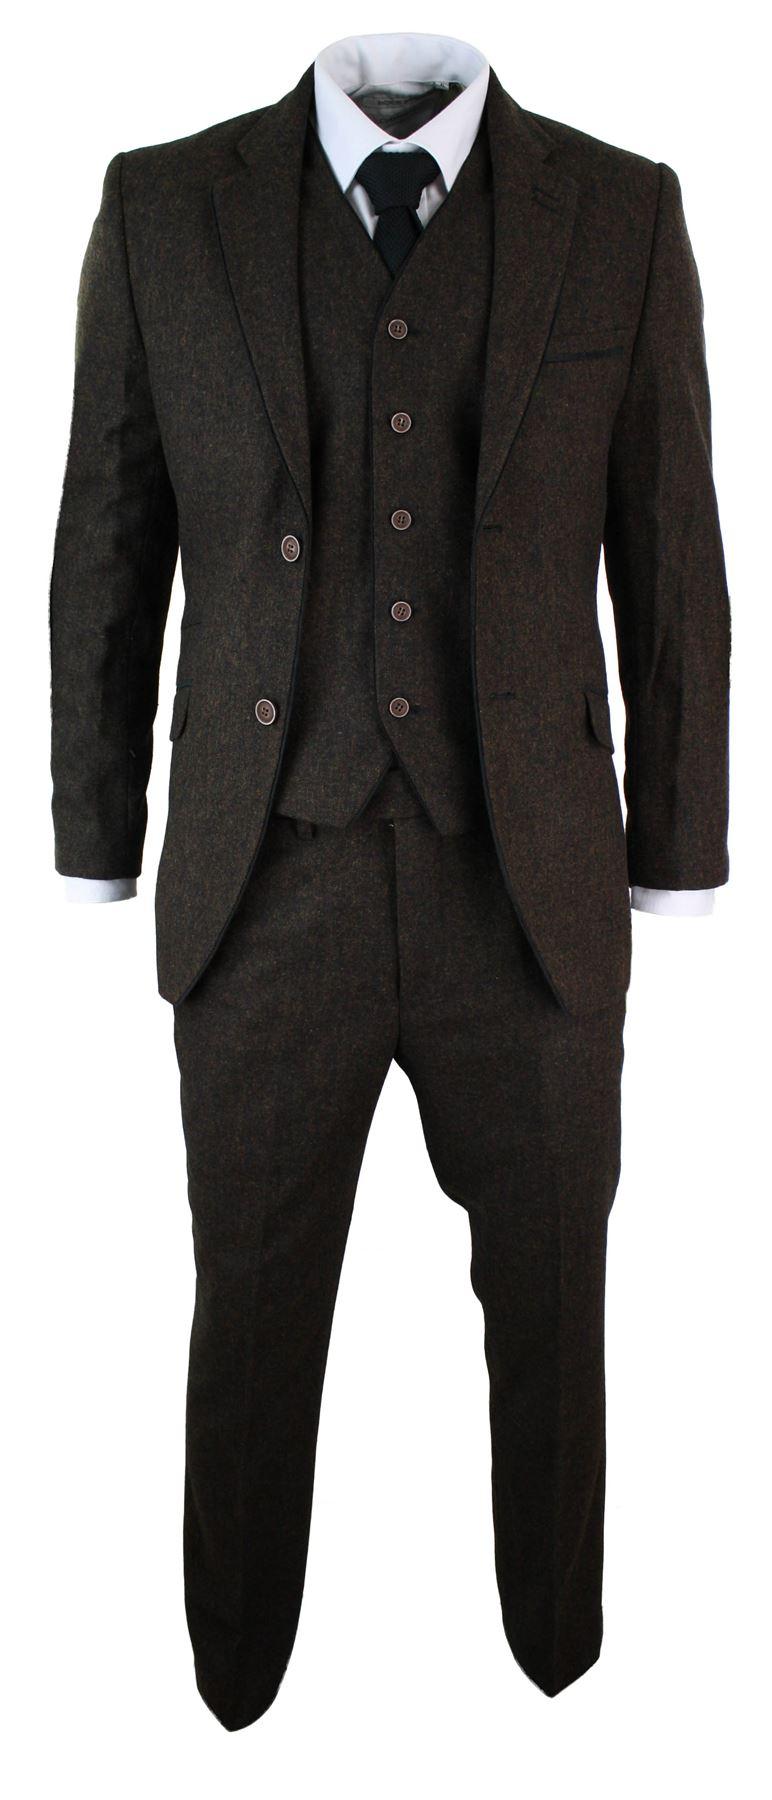 mens herringbone tweed 3 piece suit vintage tailored fit. Black Bedroom Furniture Sets. Home Design Ideas